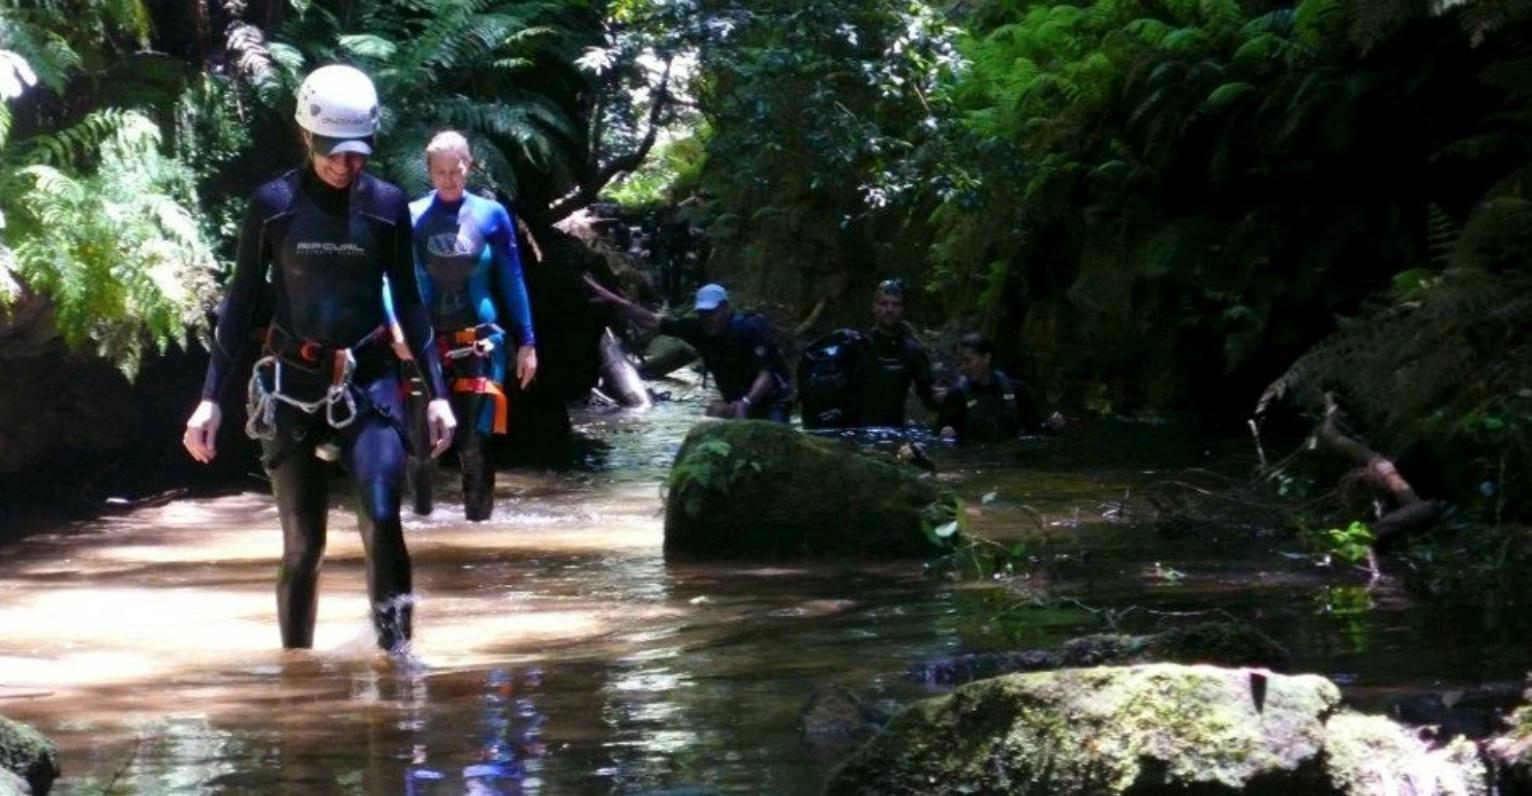 canyoning summer activities